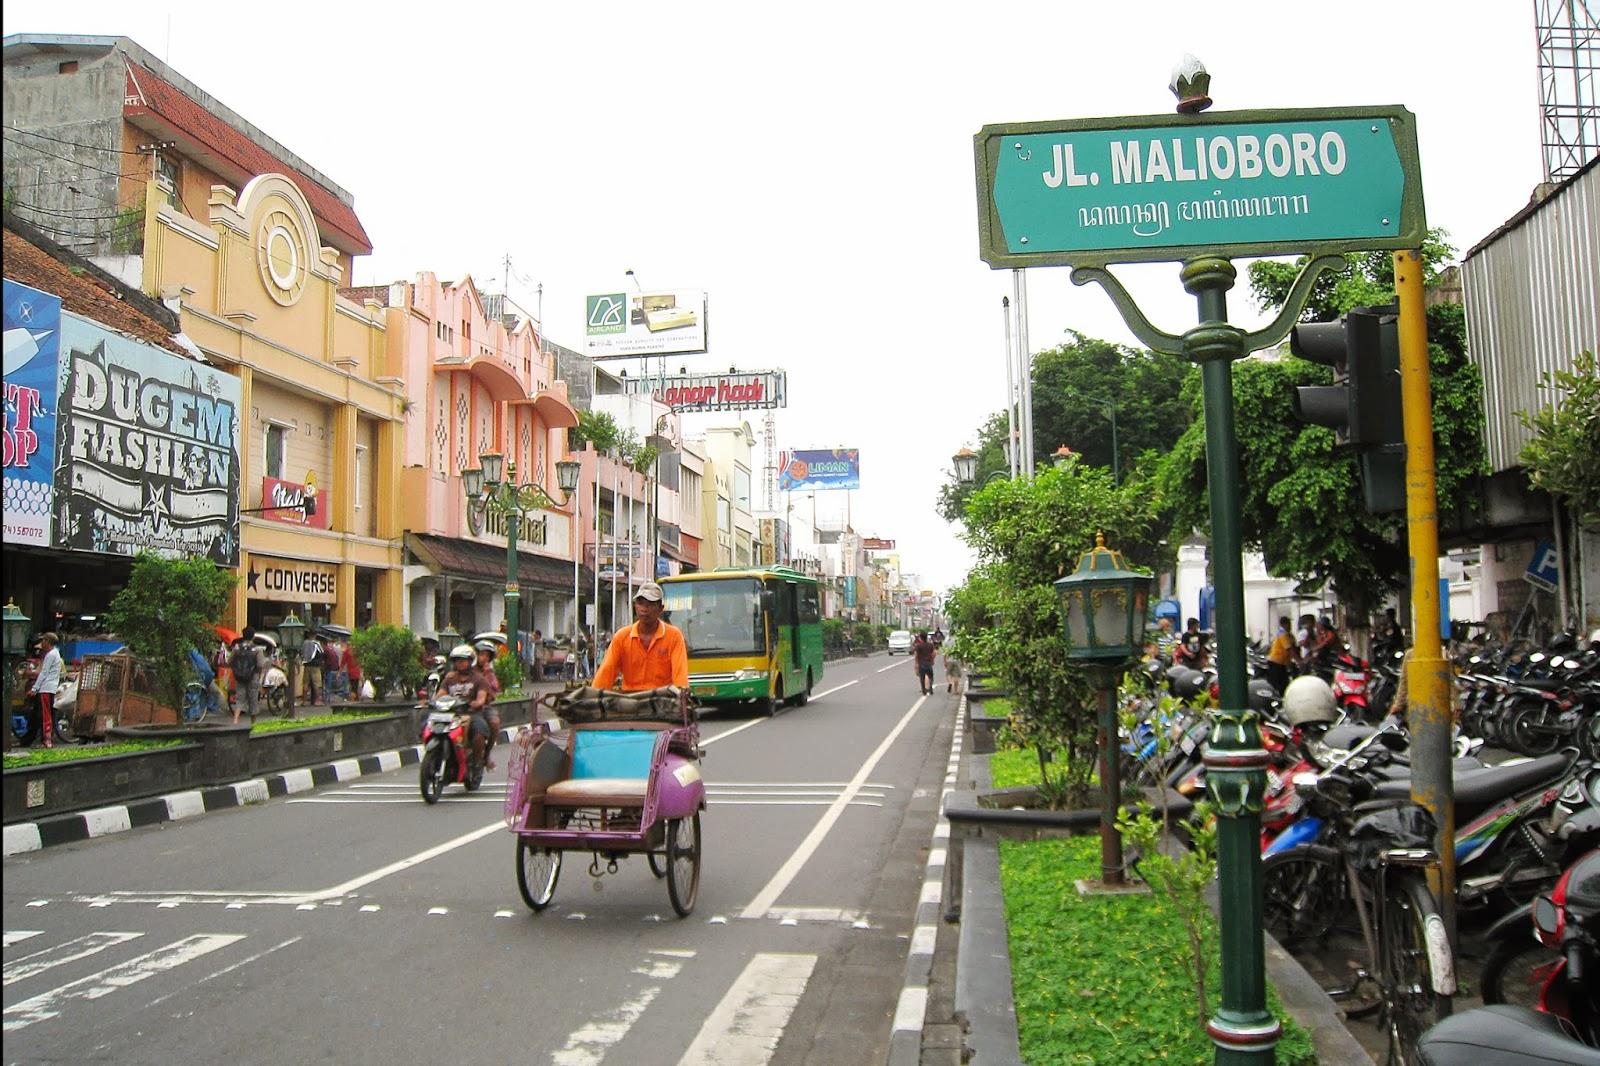 Malioboro Adalah Nama Sebuah Jalan Di Kota Jojga Yang Merupakan Tempat Pusat Perbelanjaan Terbessar Jogja Daftar Hotel Murah Dekat